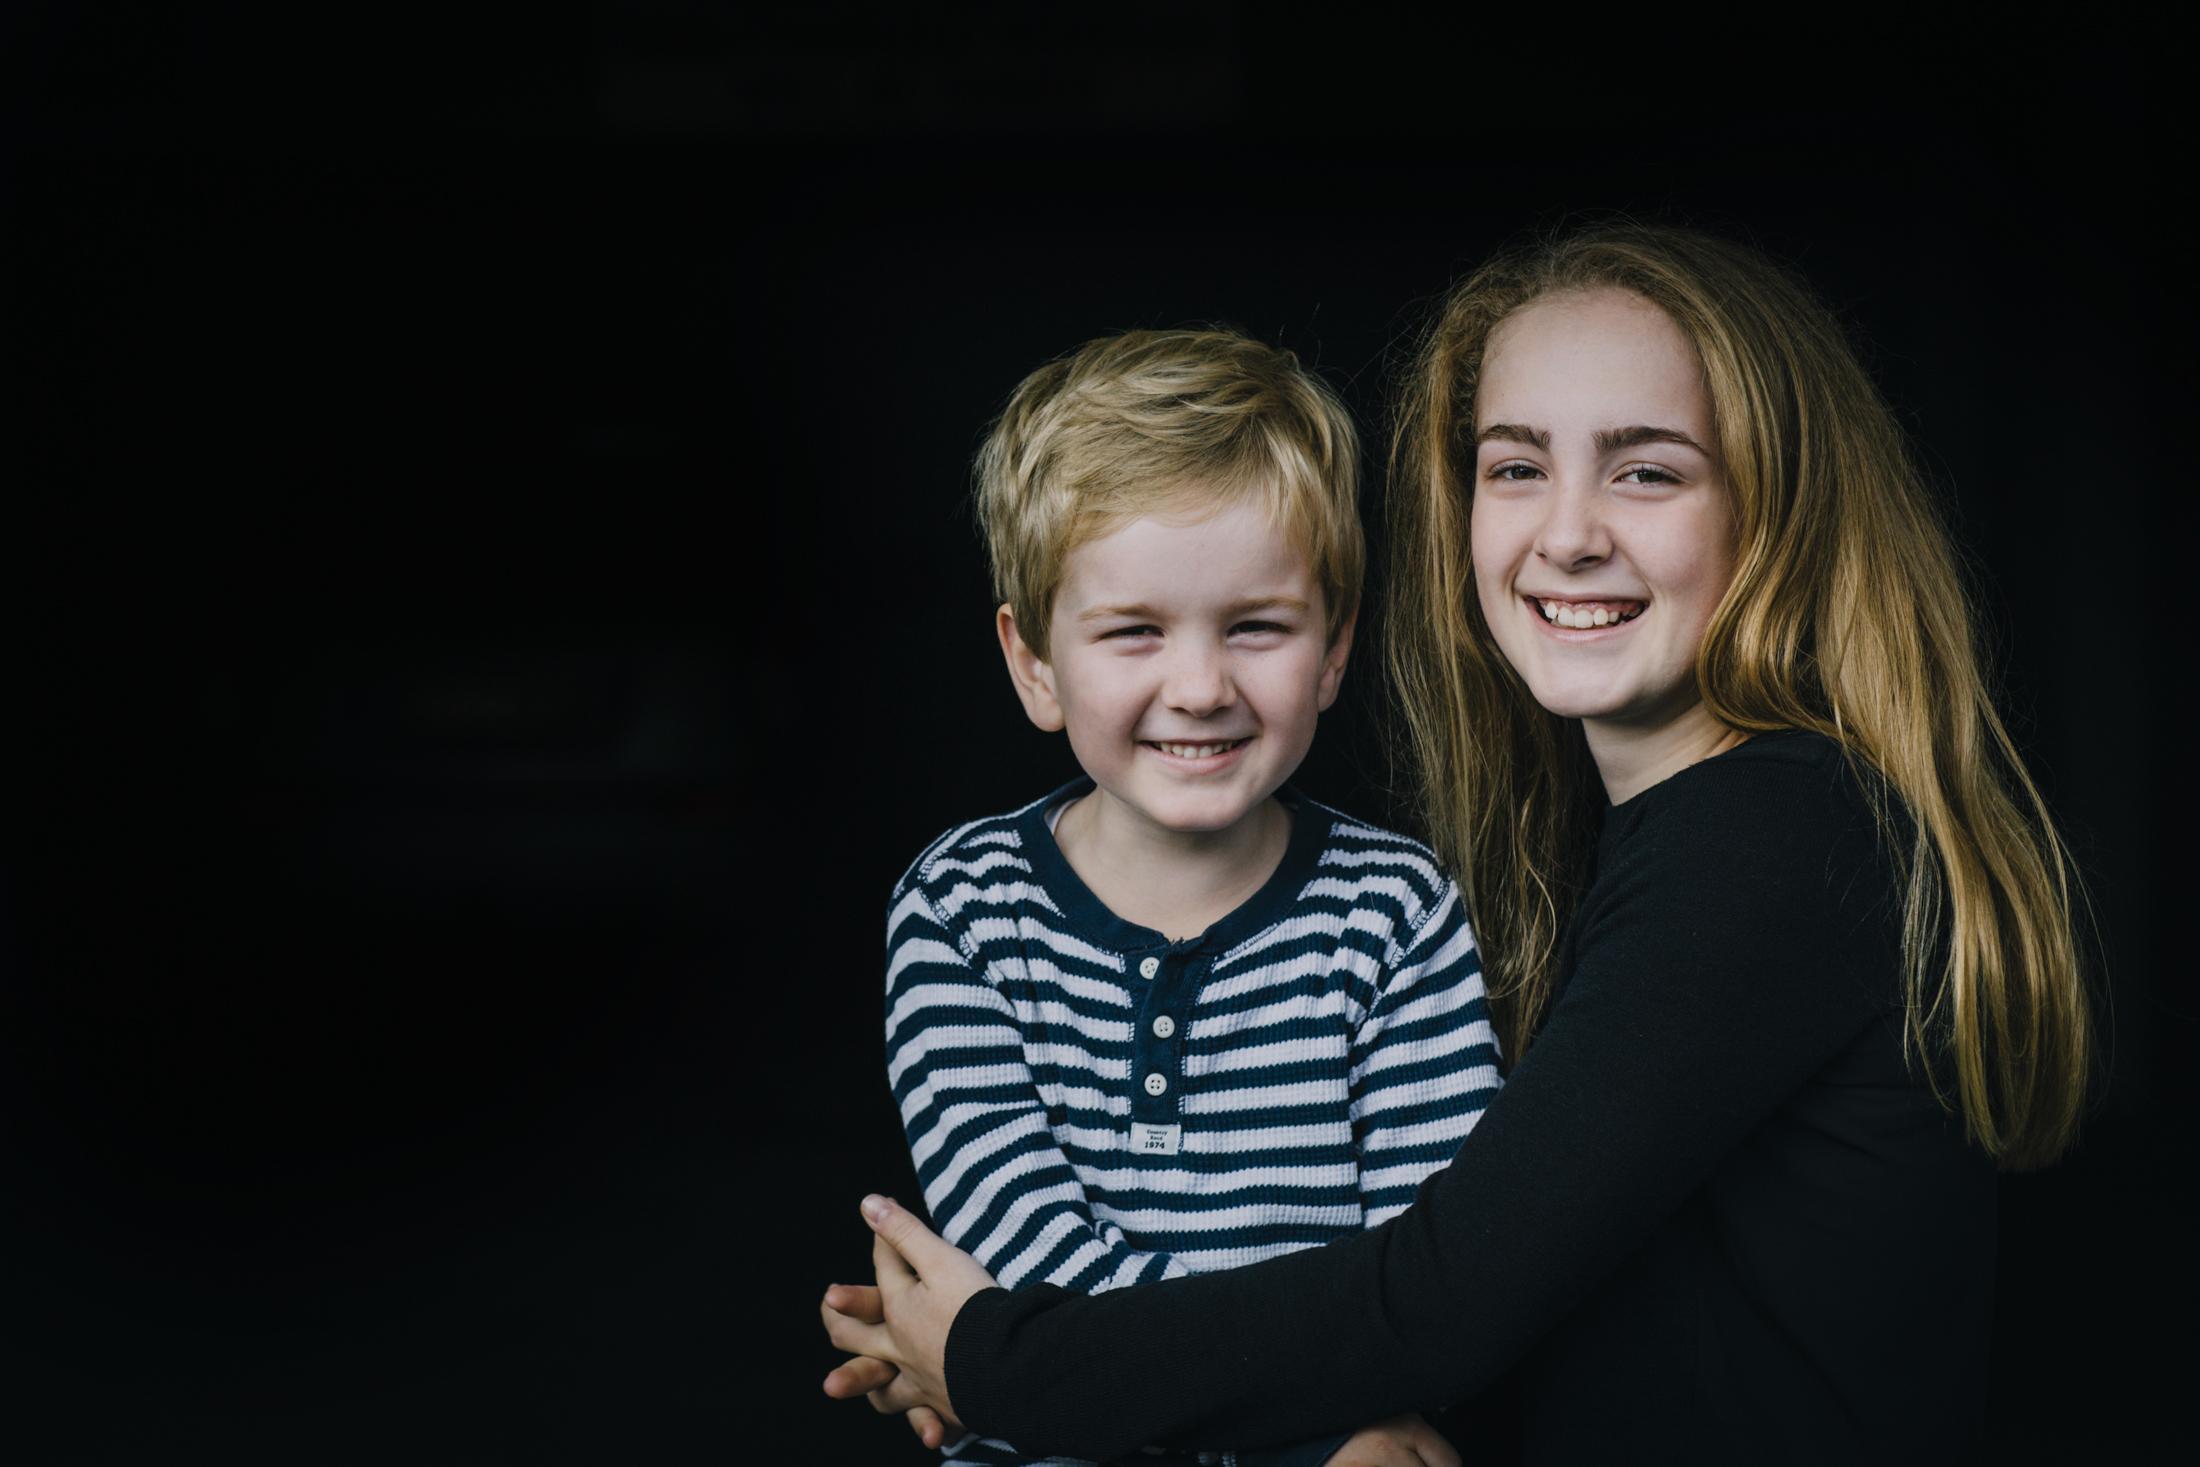 mark_taylor_sydney_family_photography_morffew-16.jpg